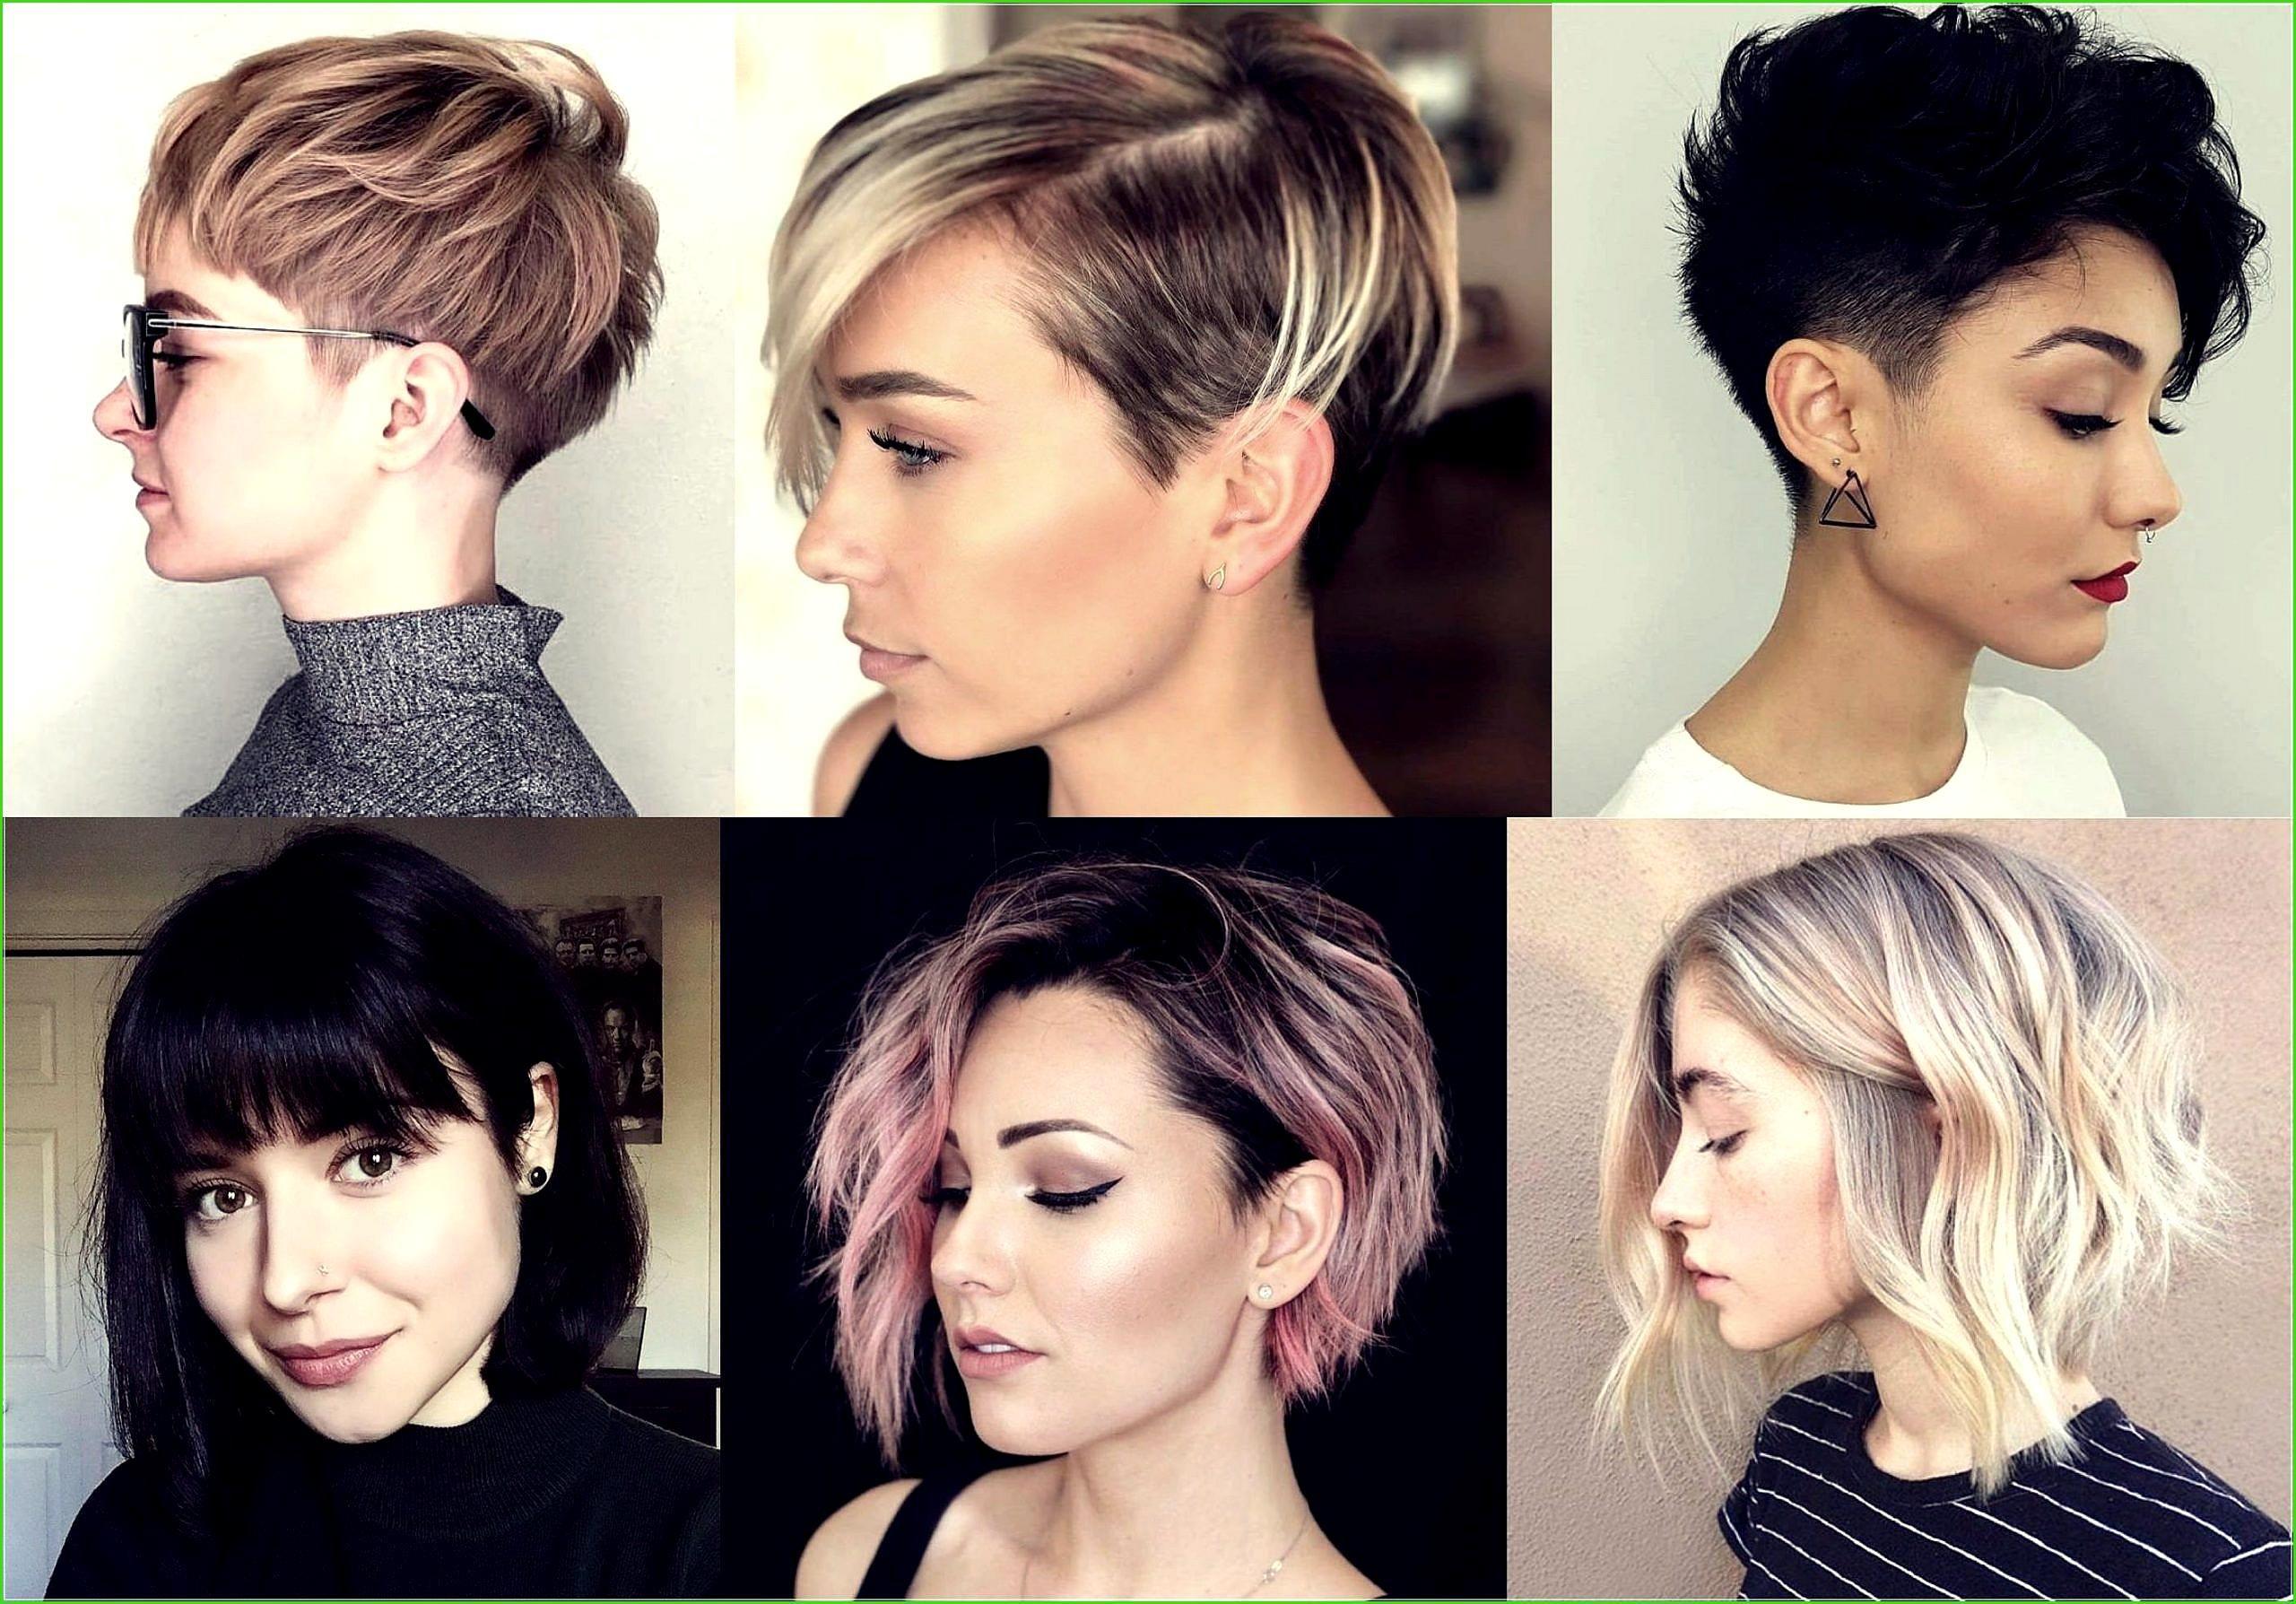 Frisuren 2020 Frauen Short 50 Dunnes Haar Haar Jull Frisuren 2020 Frauen Kurz 50 Frisuren 20 Kurzhaarschnitte Kurzhaarfrisuren Feine Dunne Haare